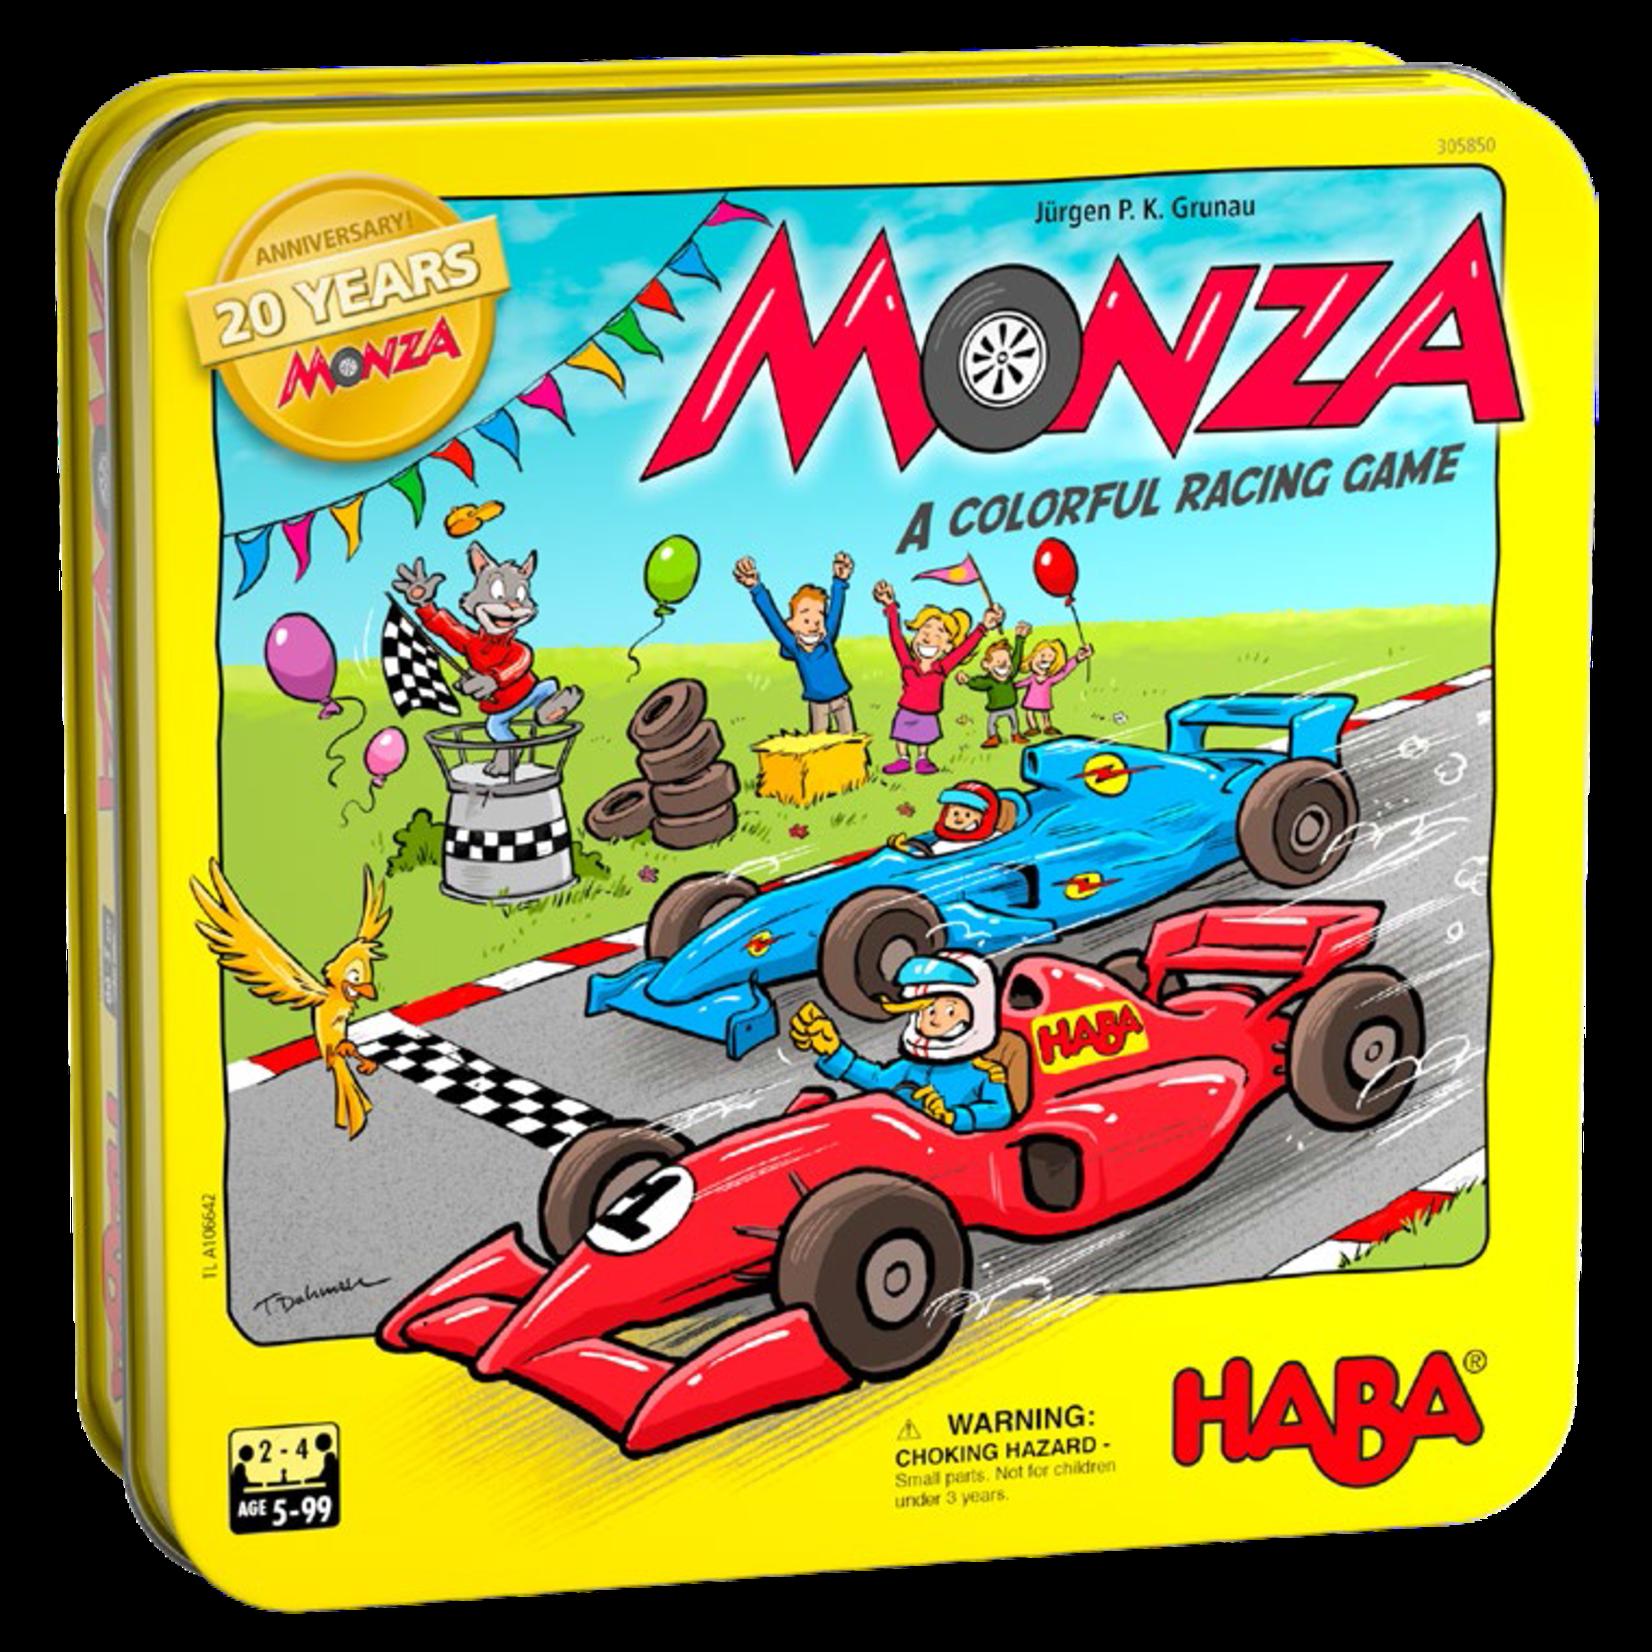 HABA USA MONZA 20th Anniversary Edition